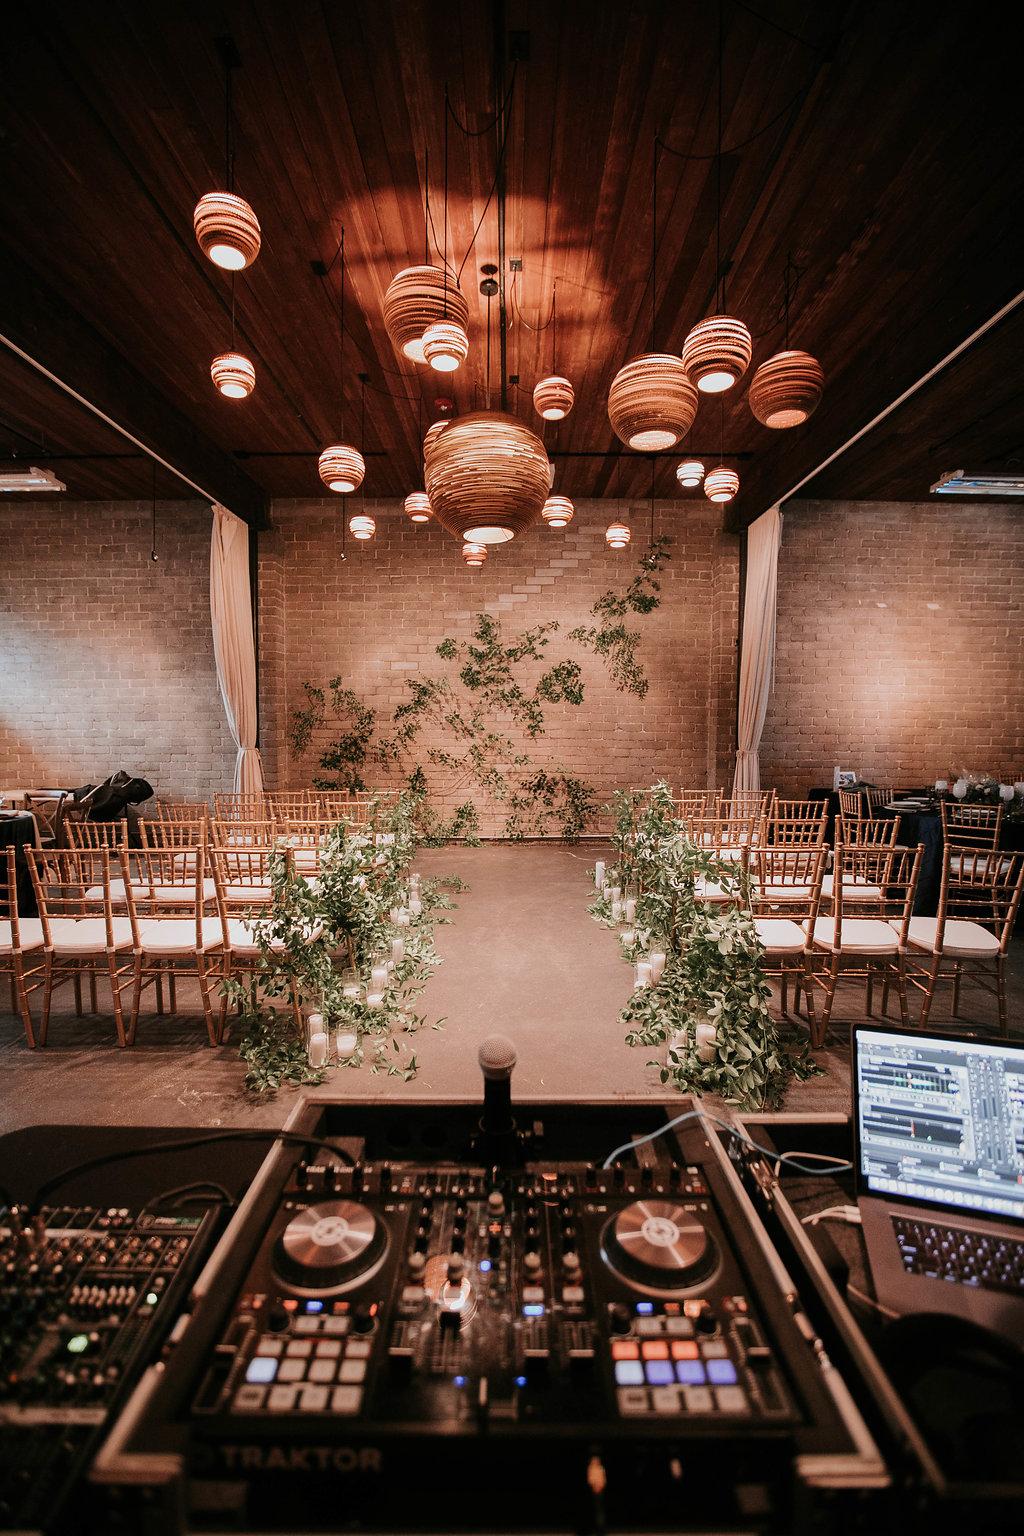 The_Big_Fake_wedding_Seattle_Within_sodo_wedding_by_Adina_Preston_Weddings_296.JPG